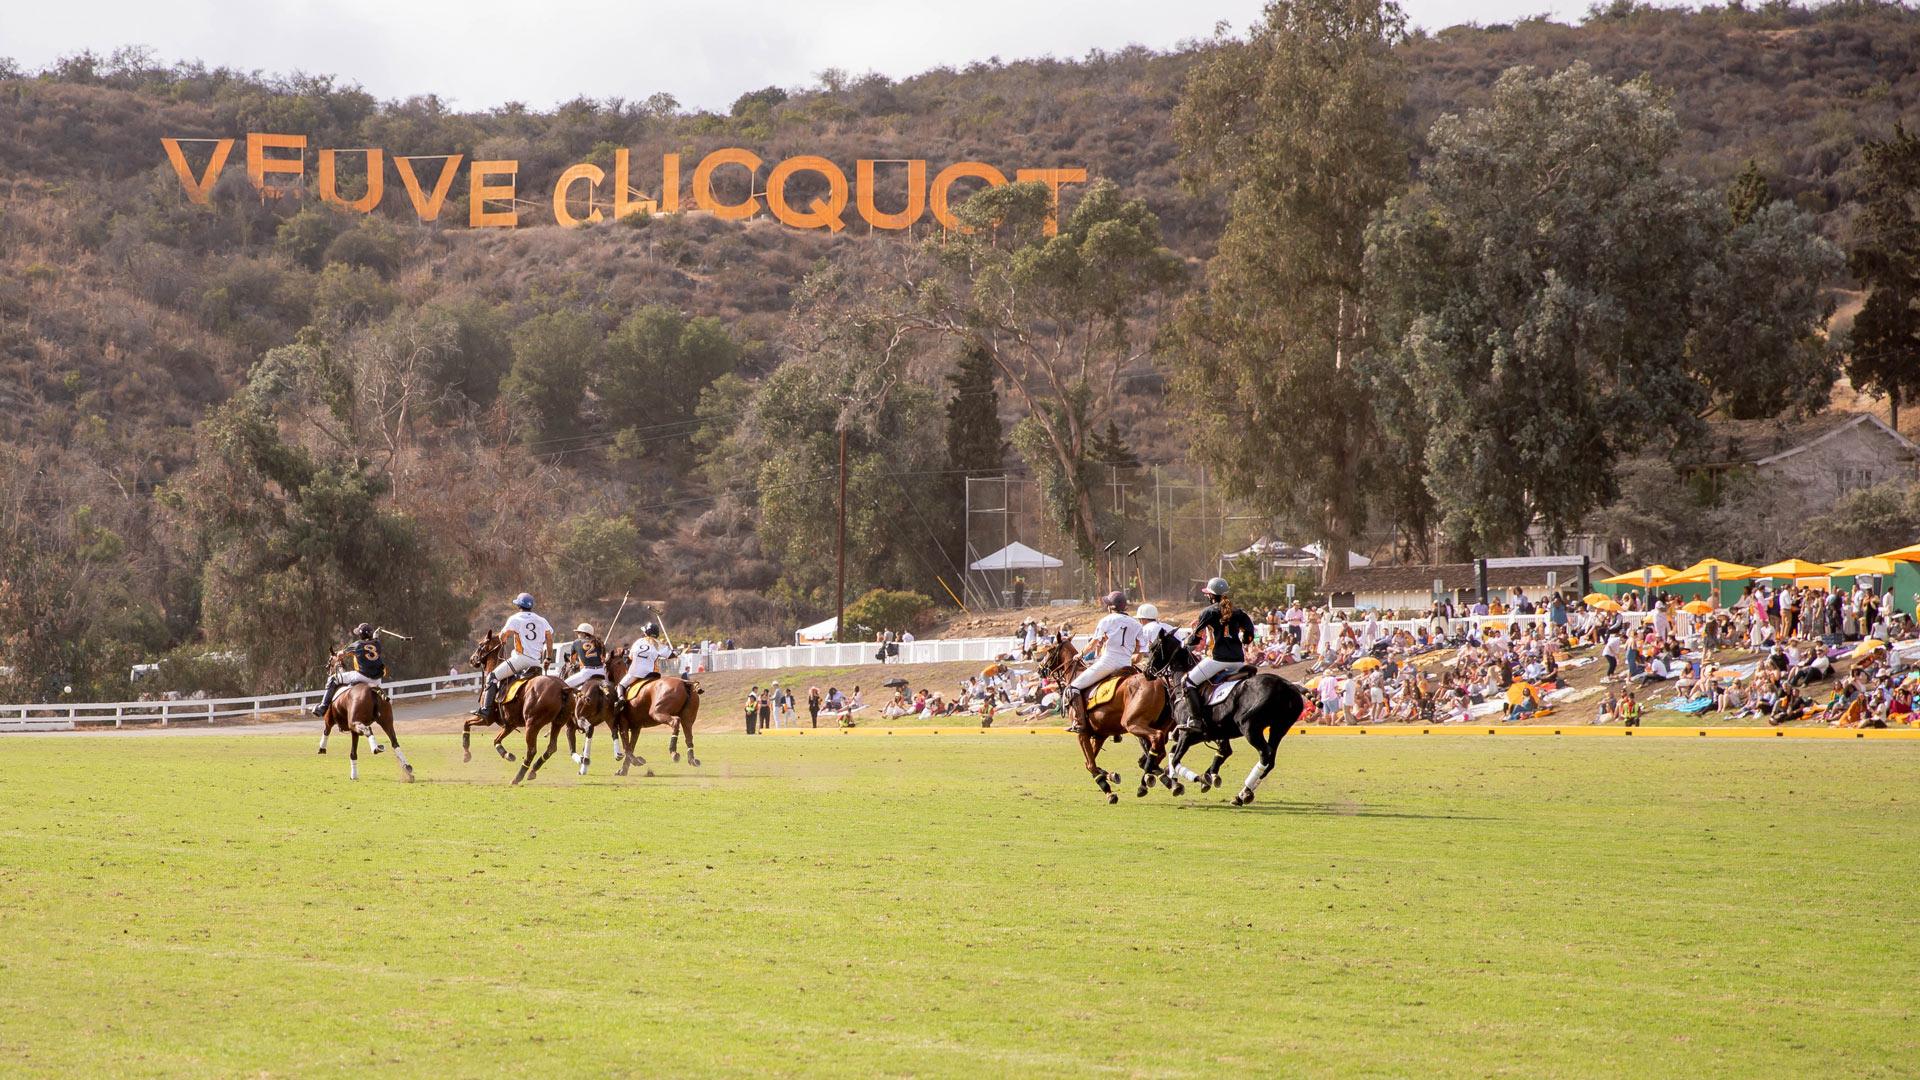 Jennifer Lake Zoom Background Veuve Clicquot Polo Classic Los Angeles